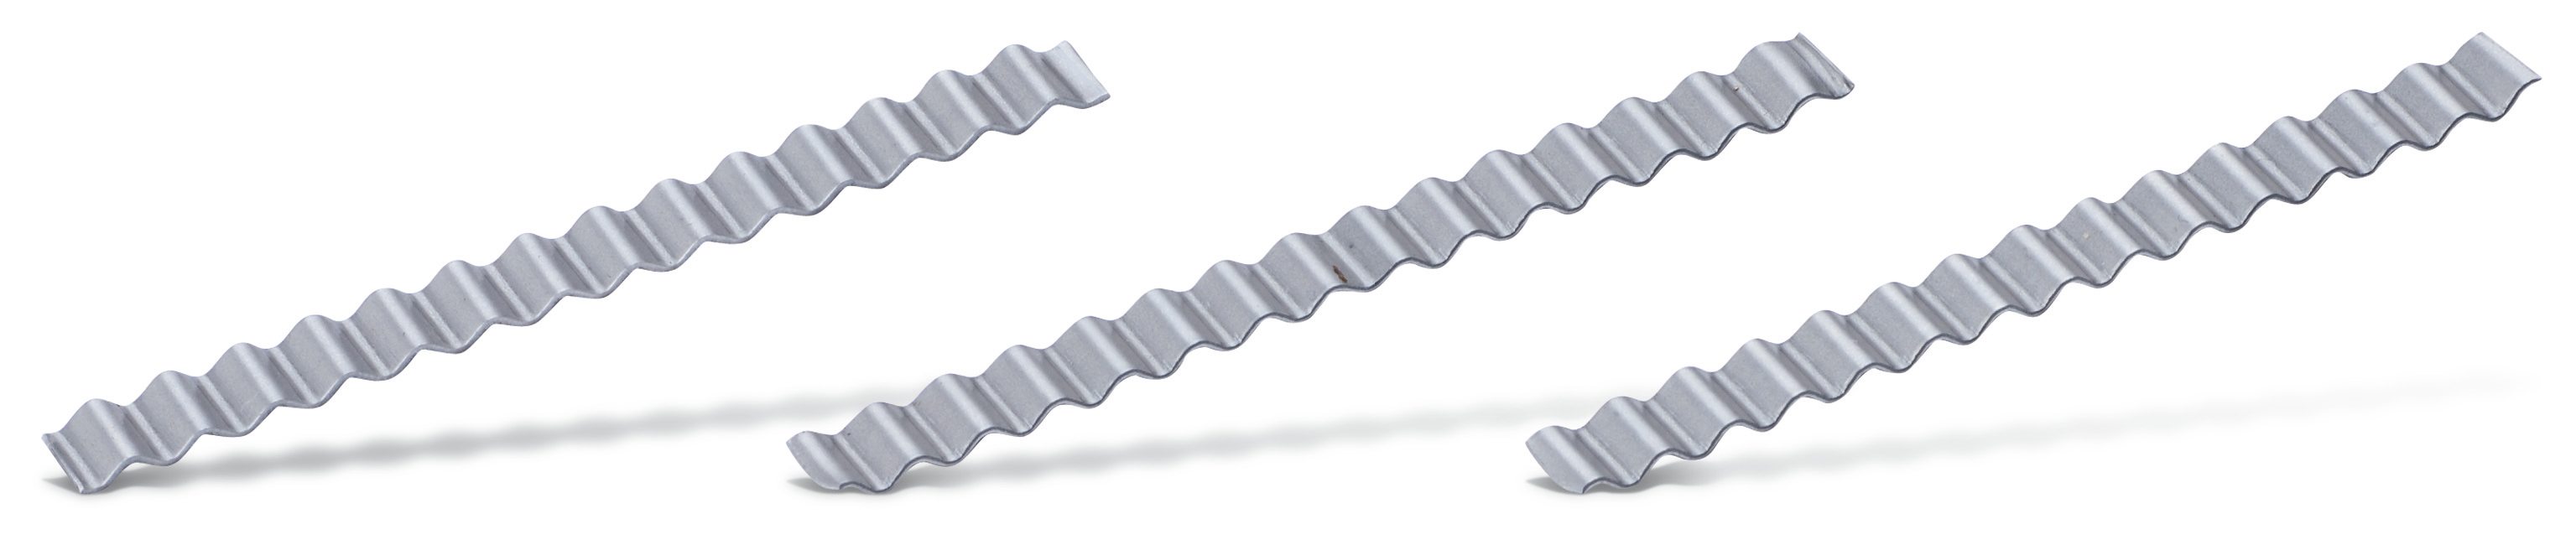 Corrugated links Pajarito